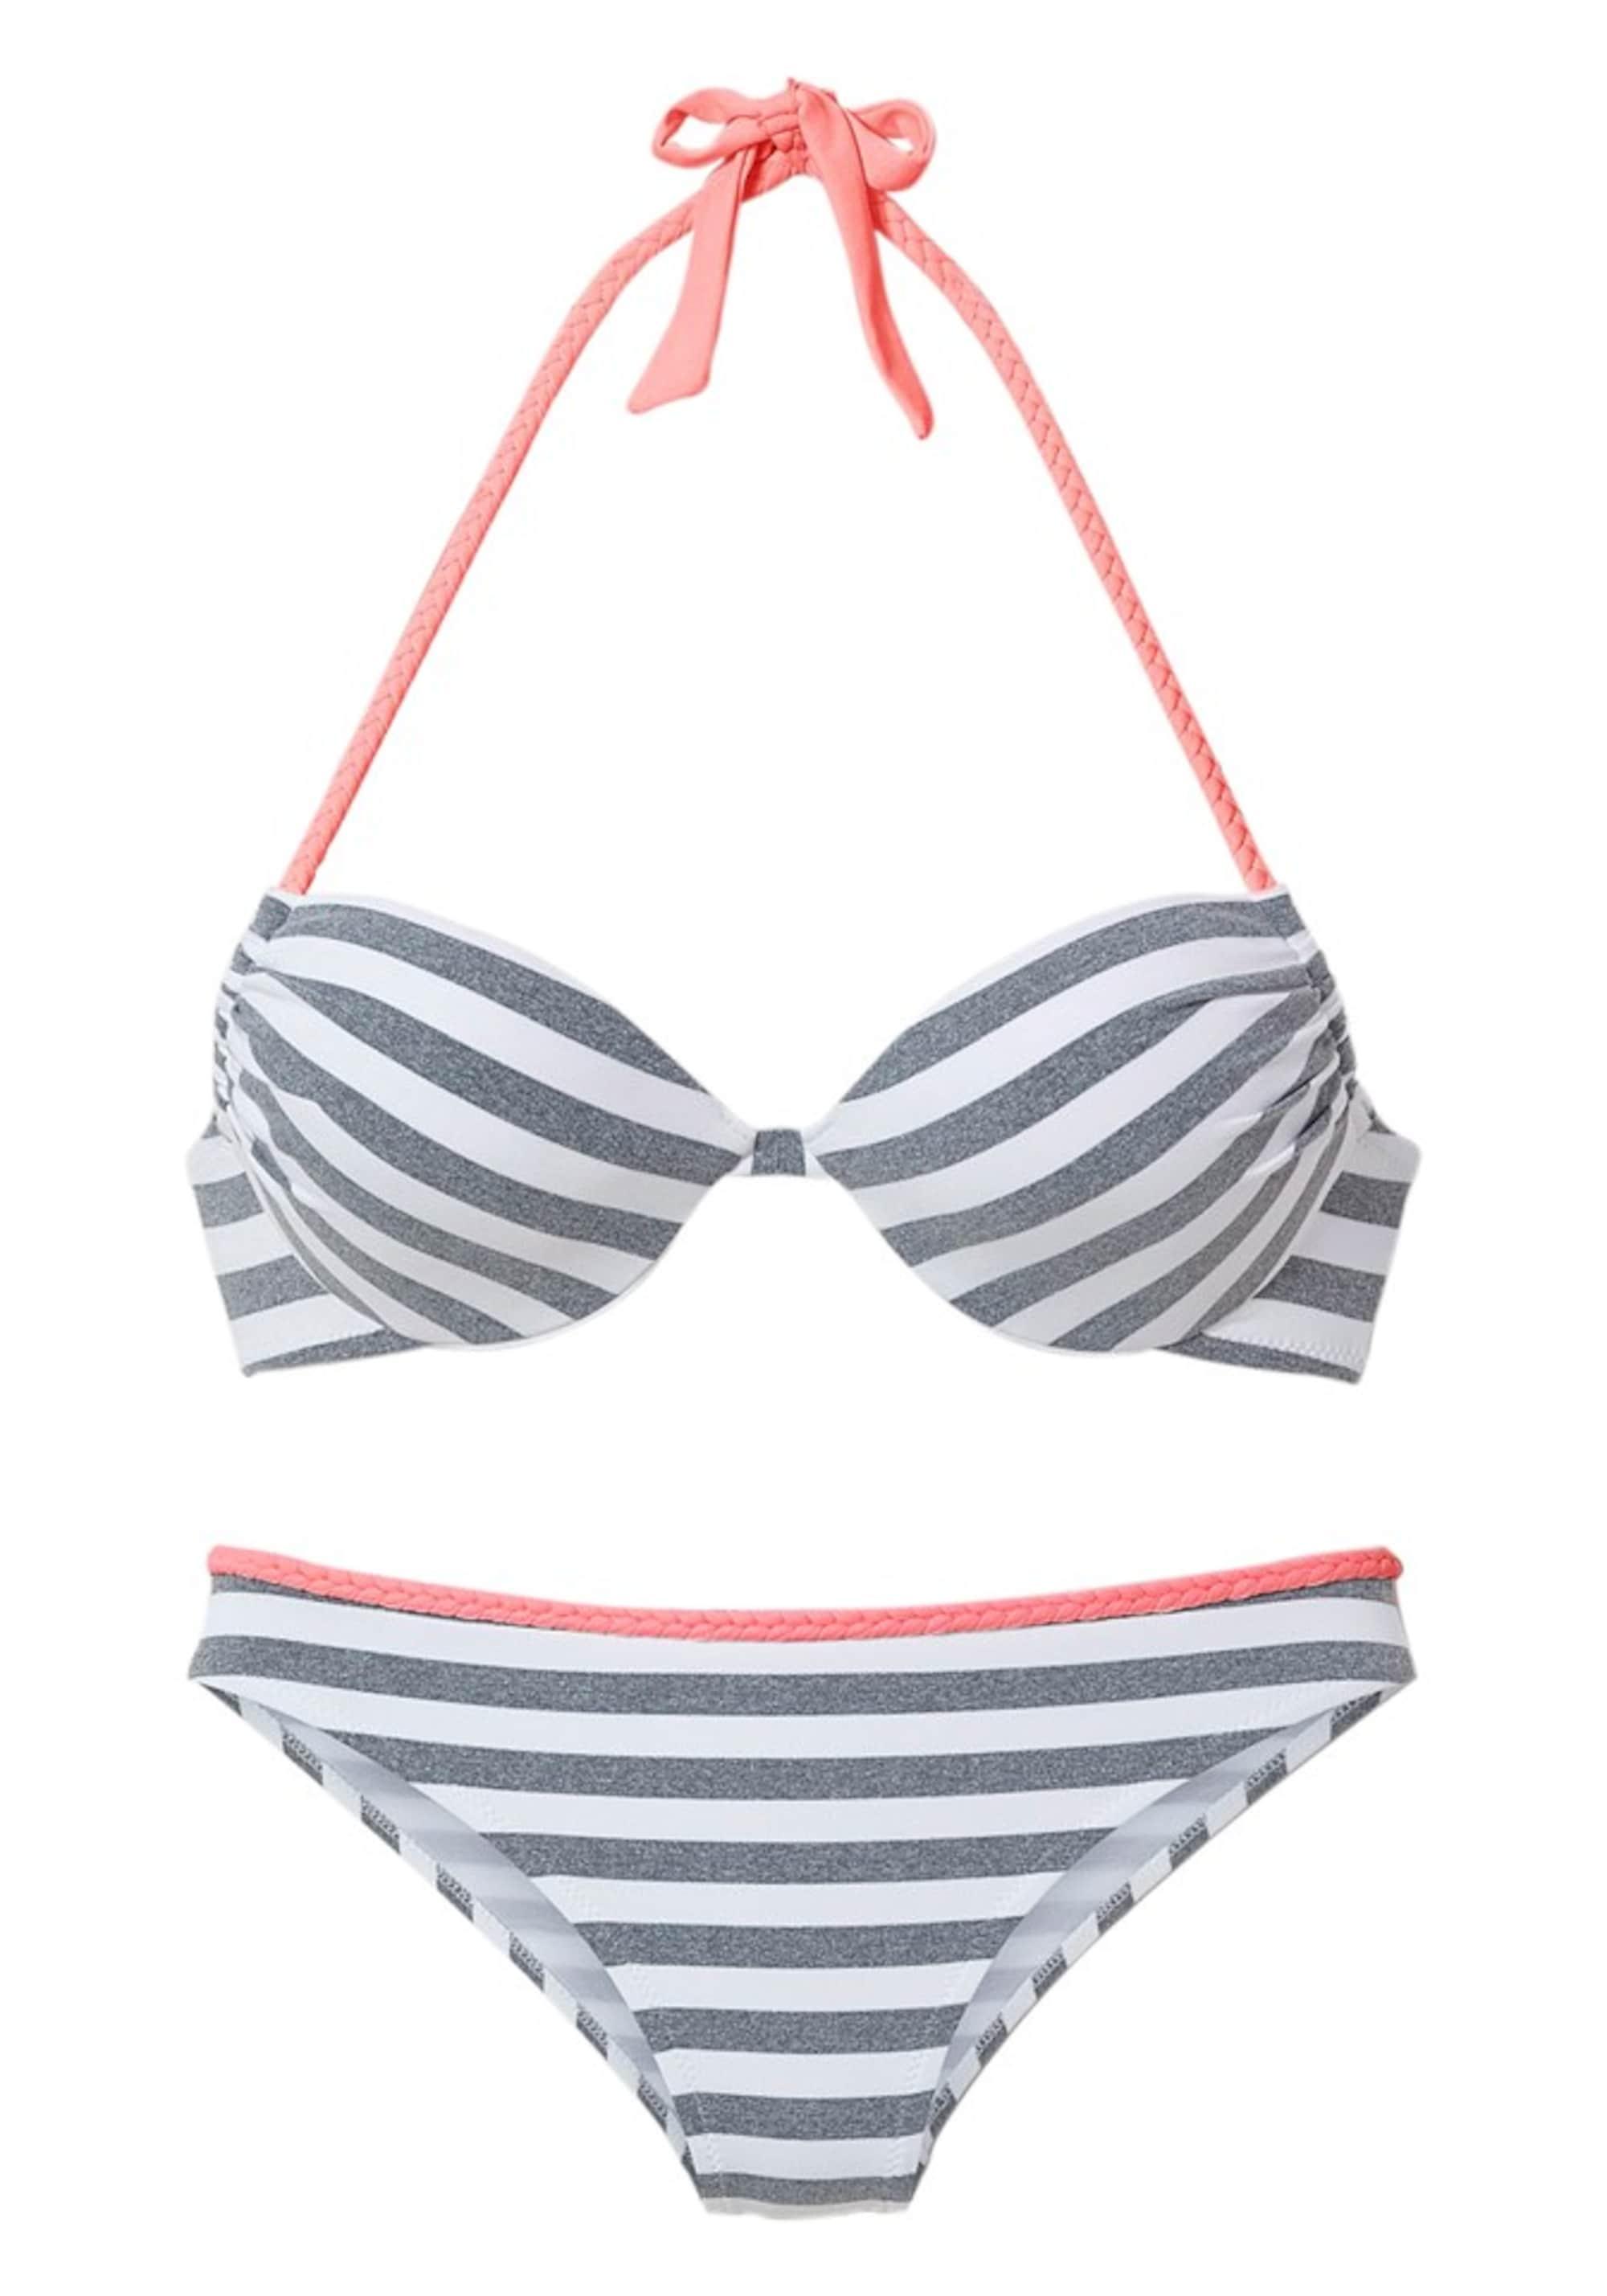 Image of Push-up Bikini